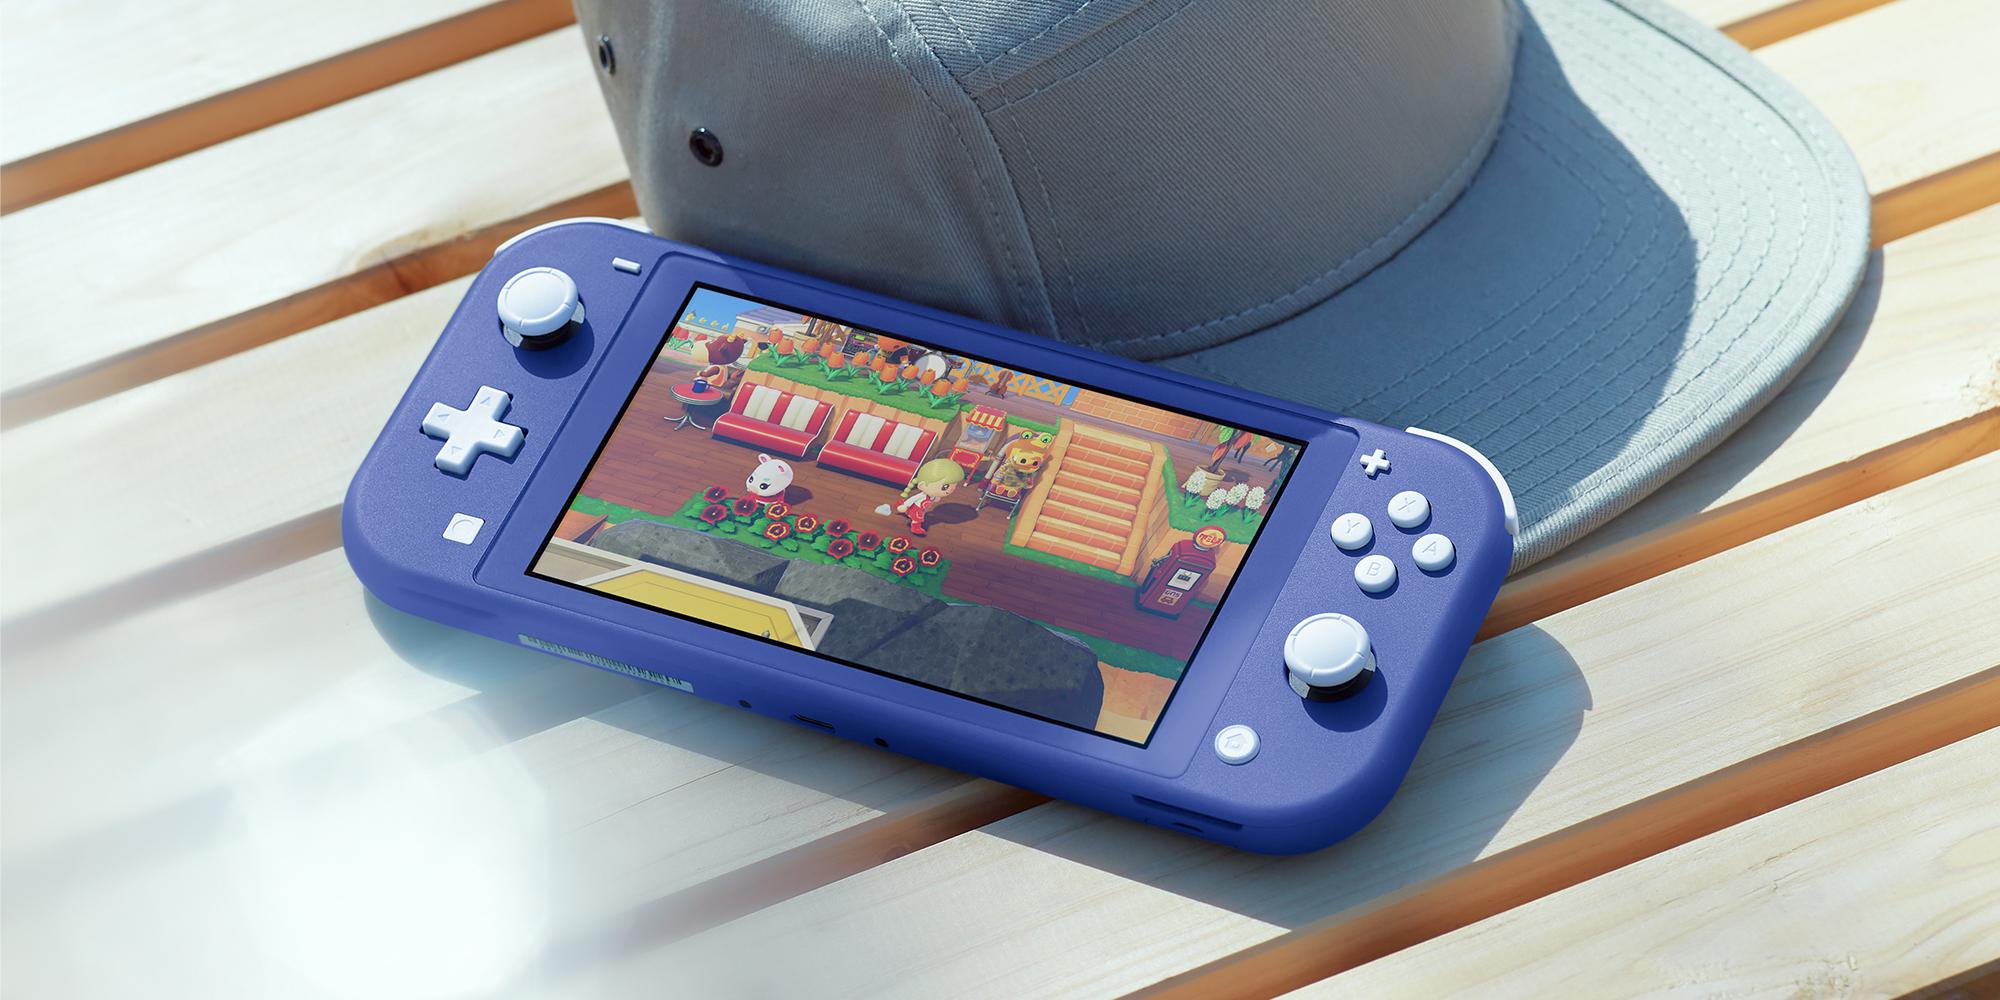 La Nintendo Switch Lite recevra un coloris bleu en mai